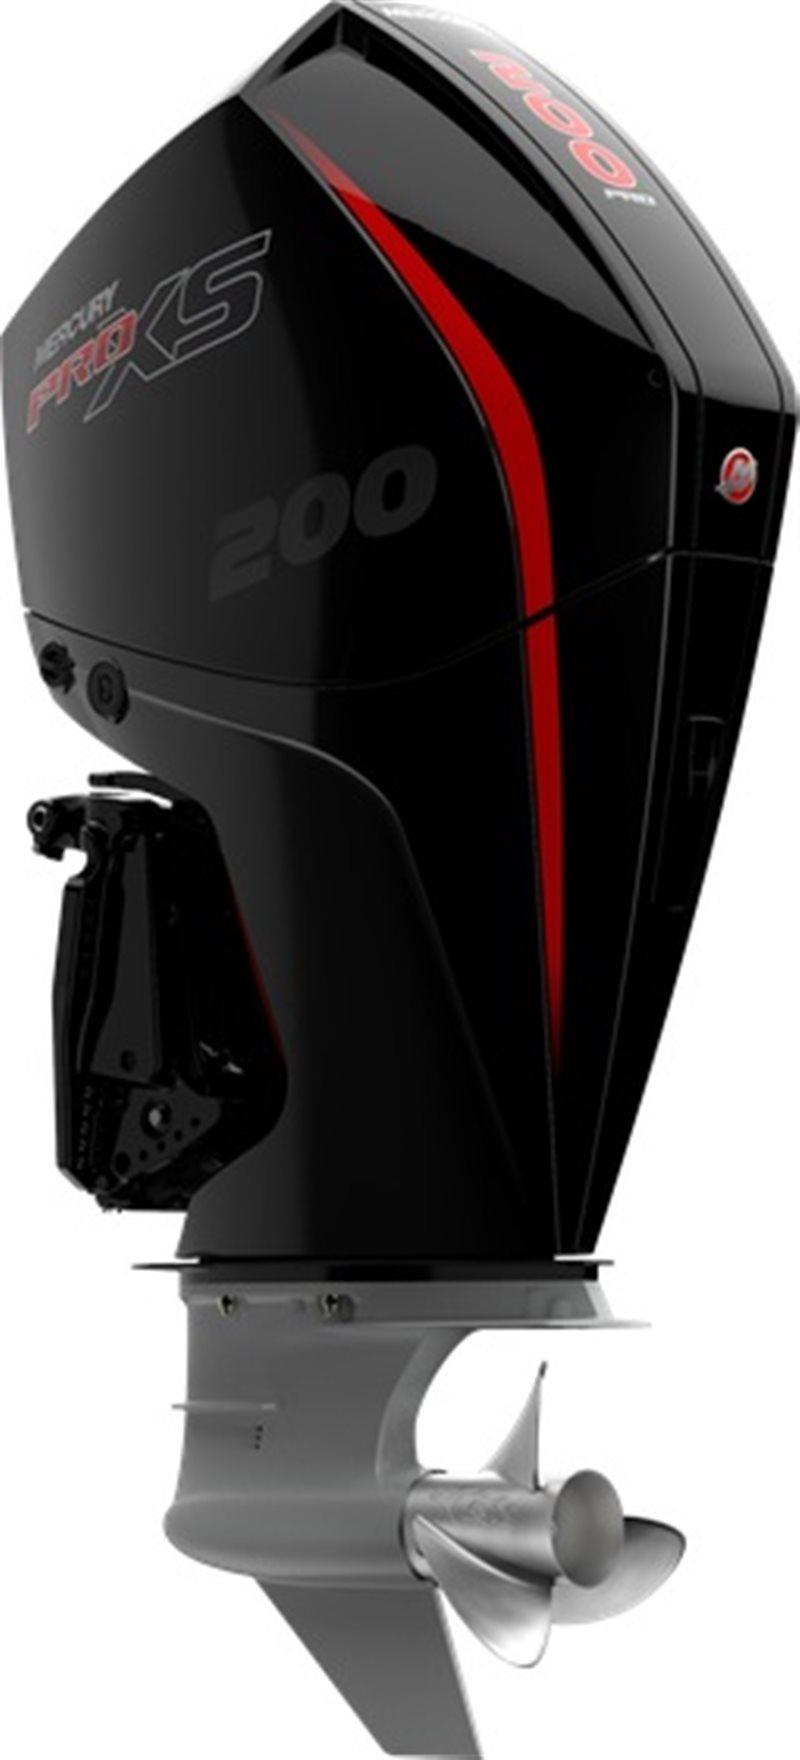 Pro XS 200 at DT Powersports & Marine